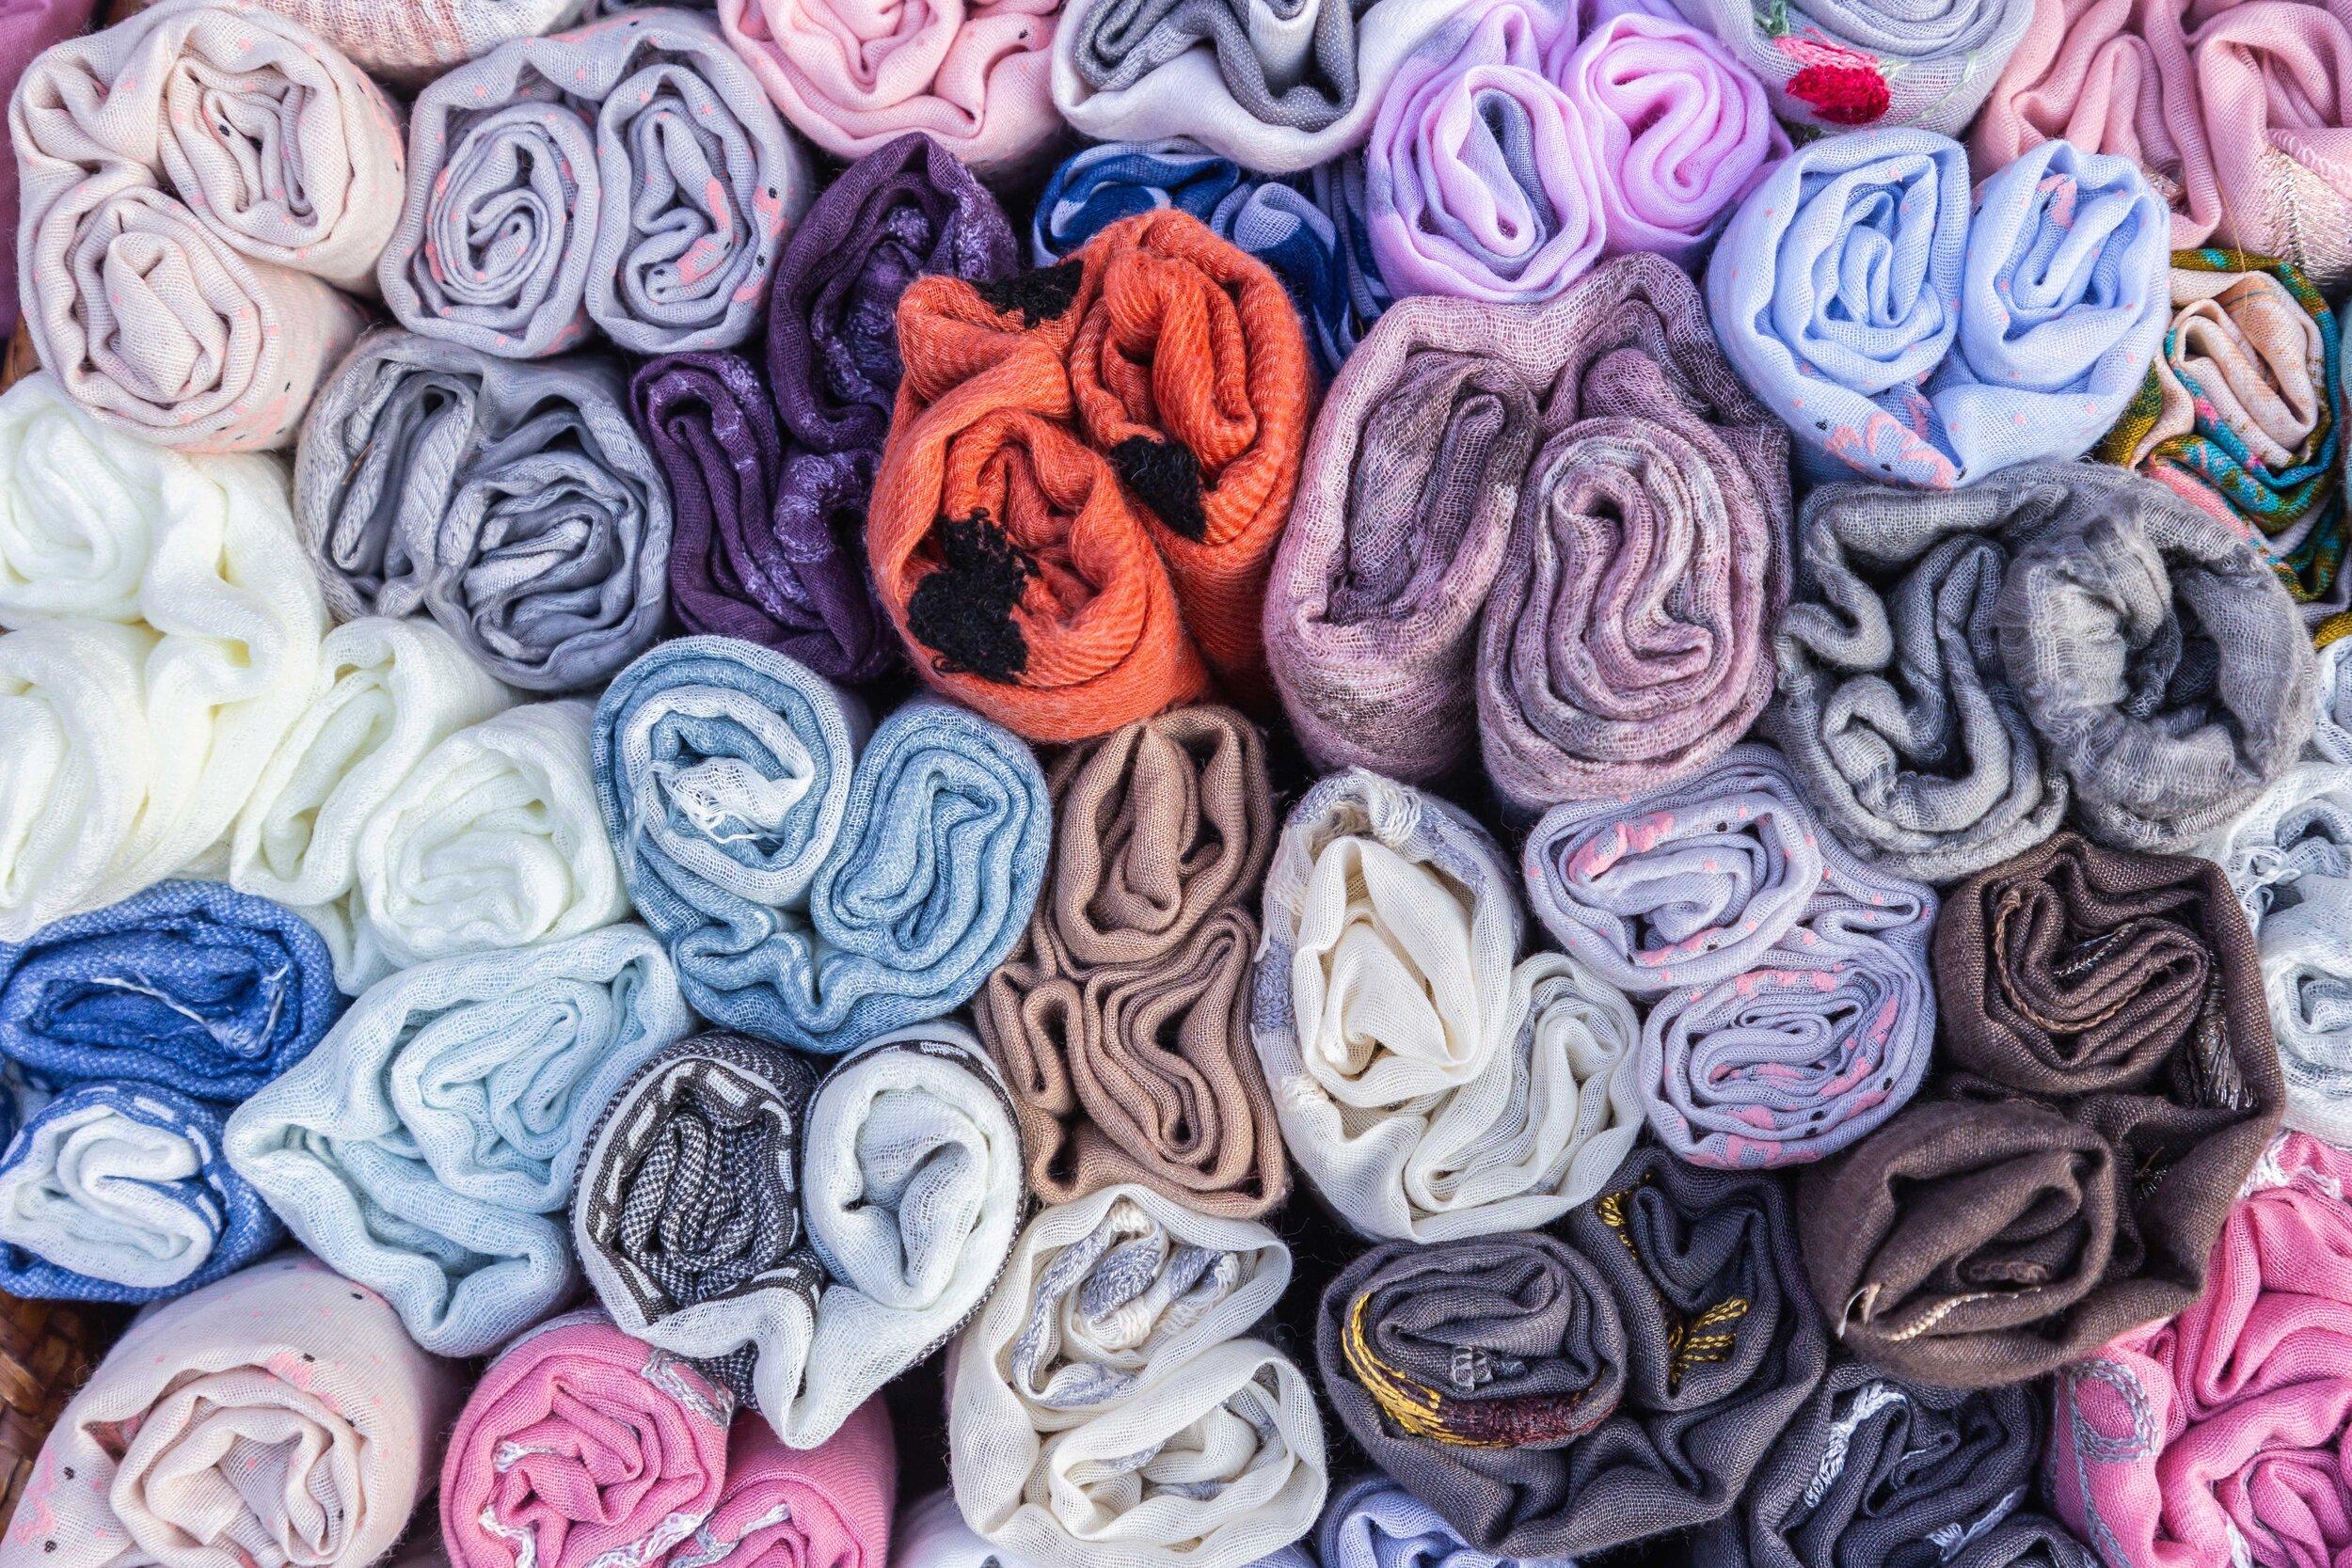 bigstock-Fabric-Texture-Or-Fabric-Backg-239473975_2.jpg